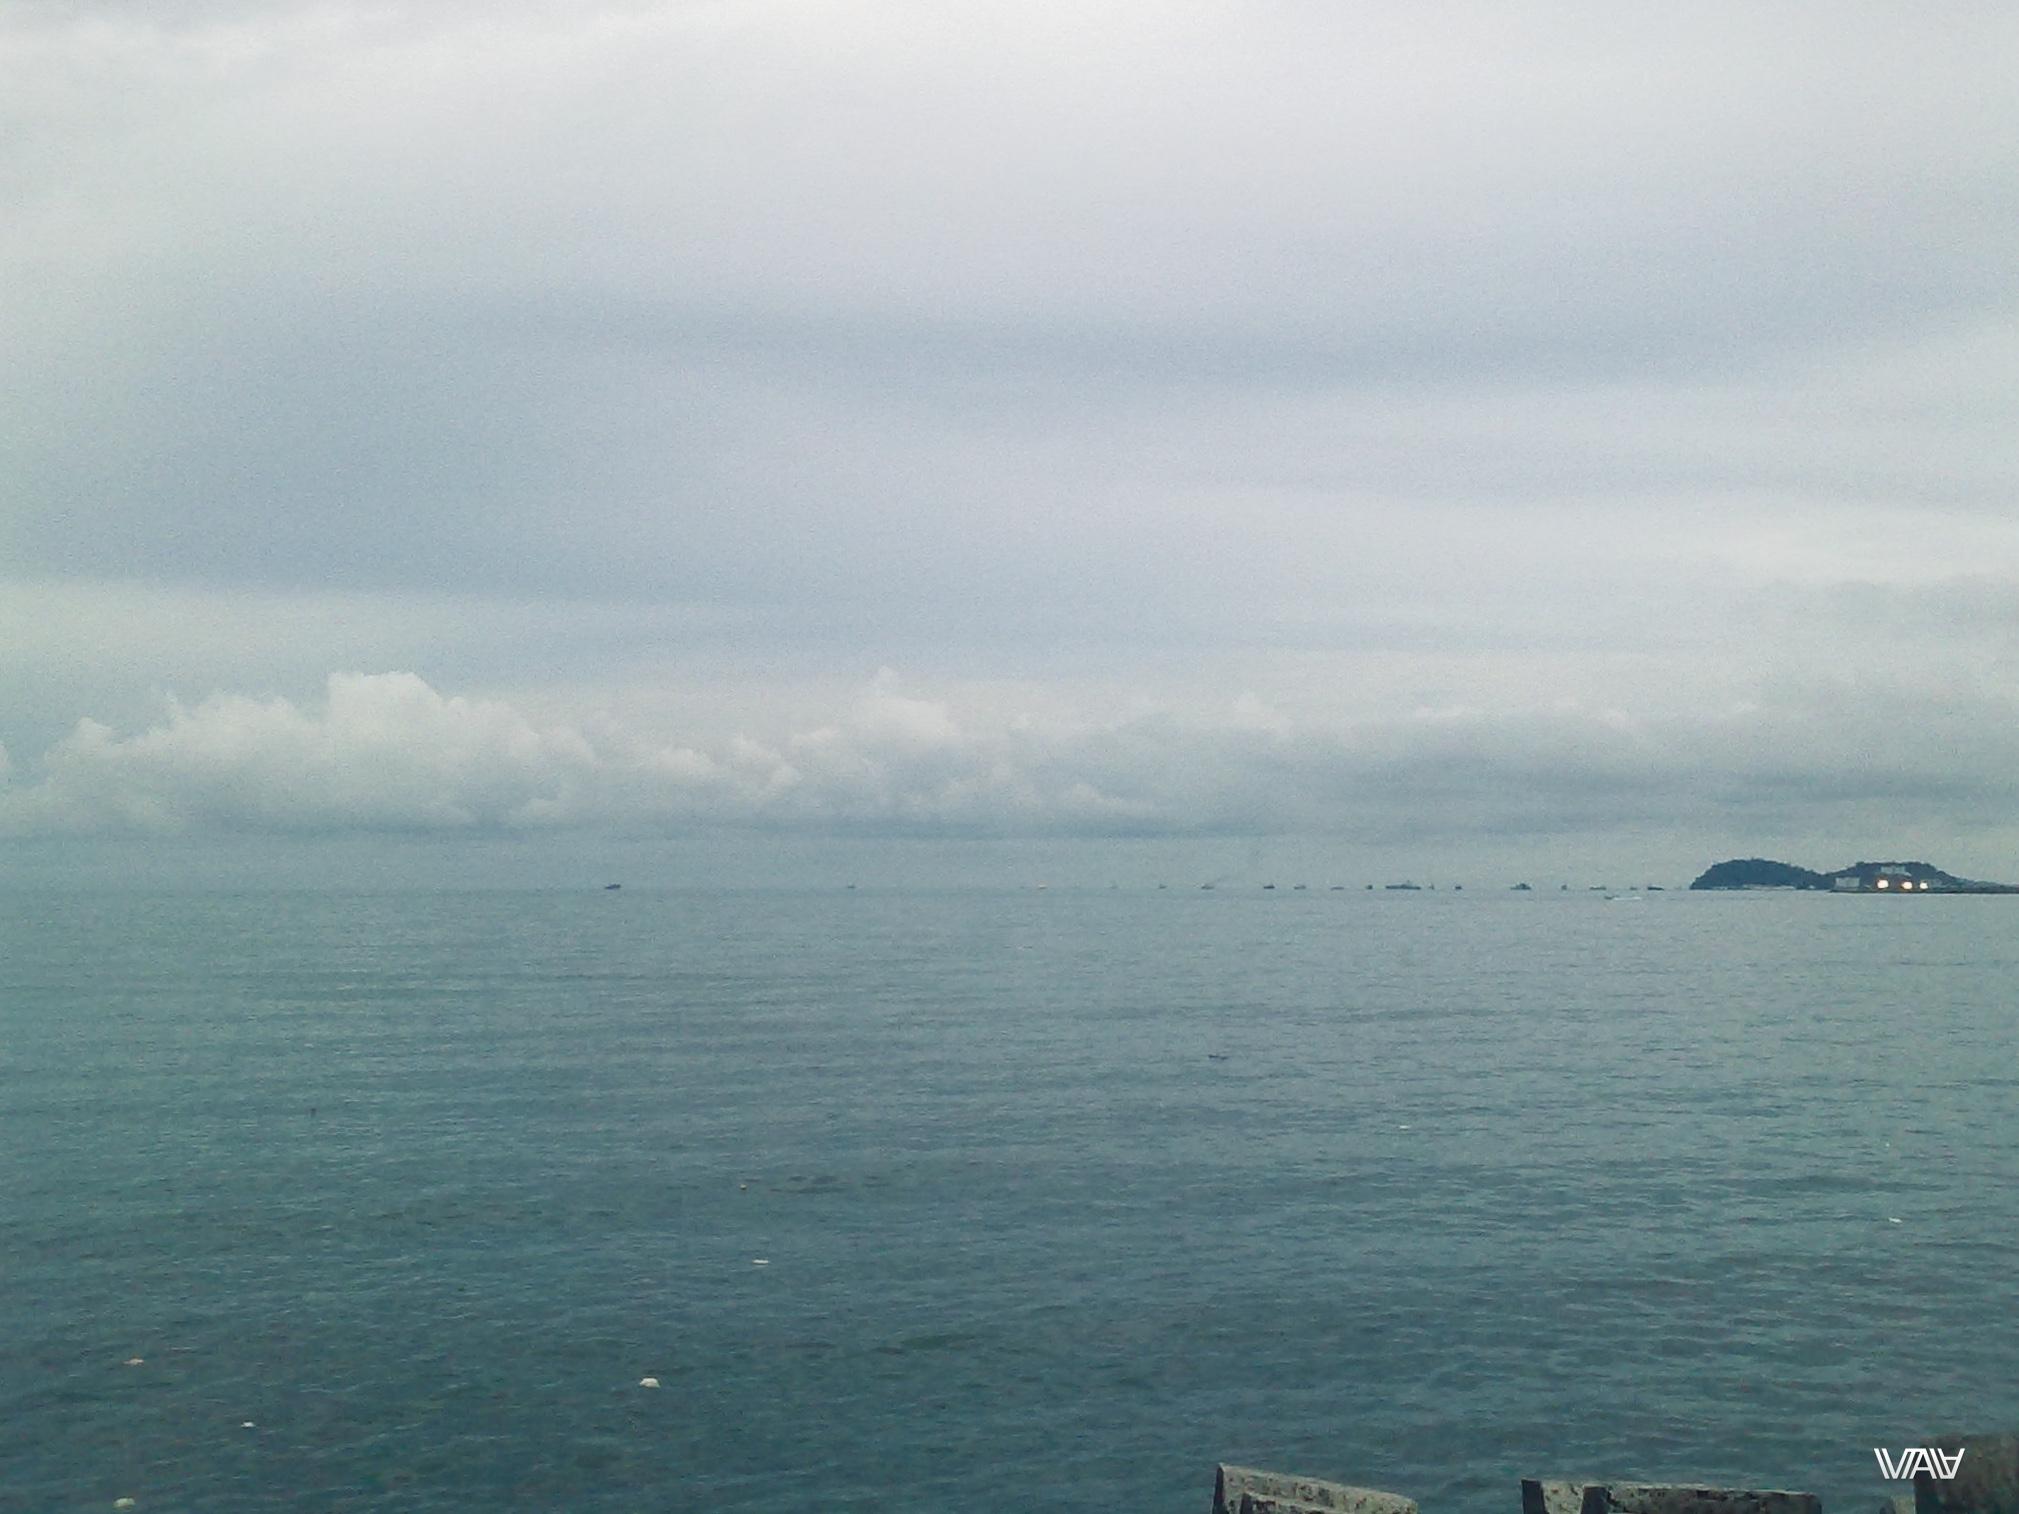 Вид на океан с побережья Панама Сити.